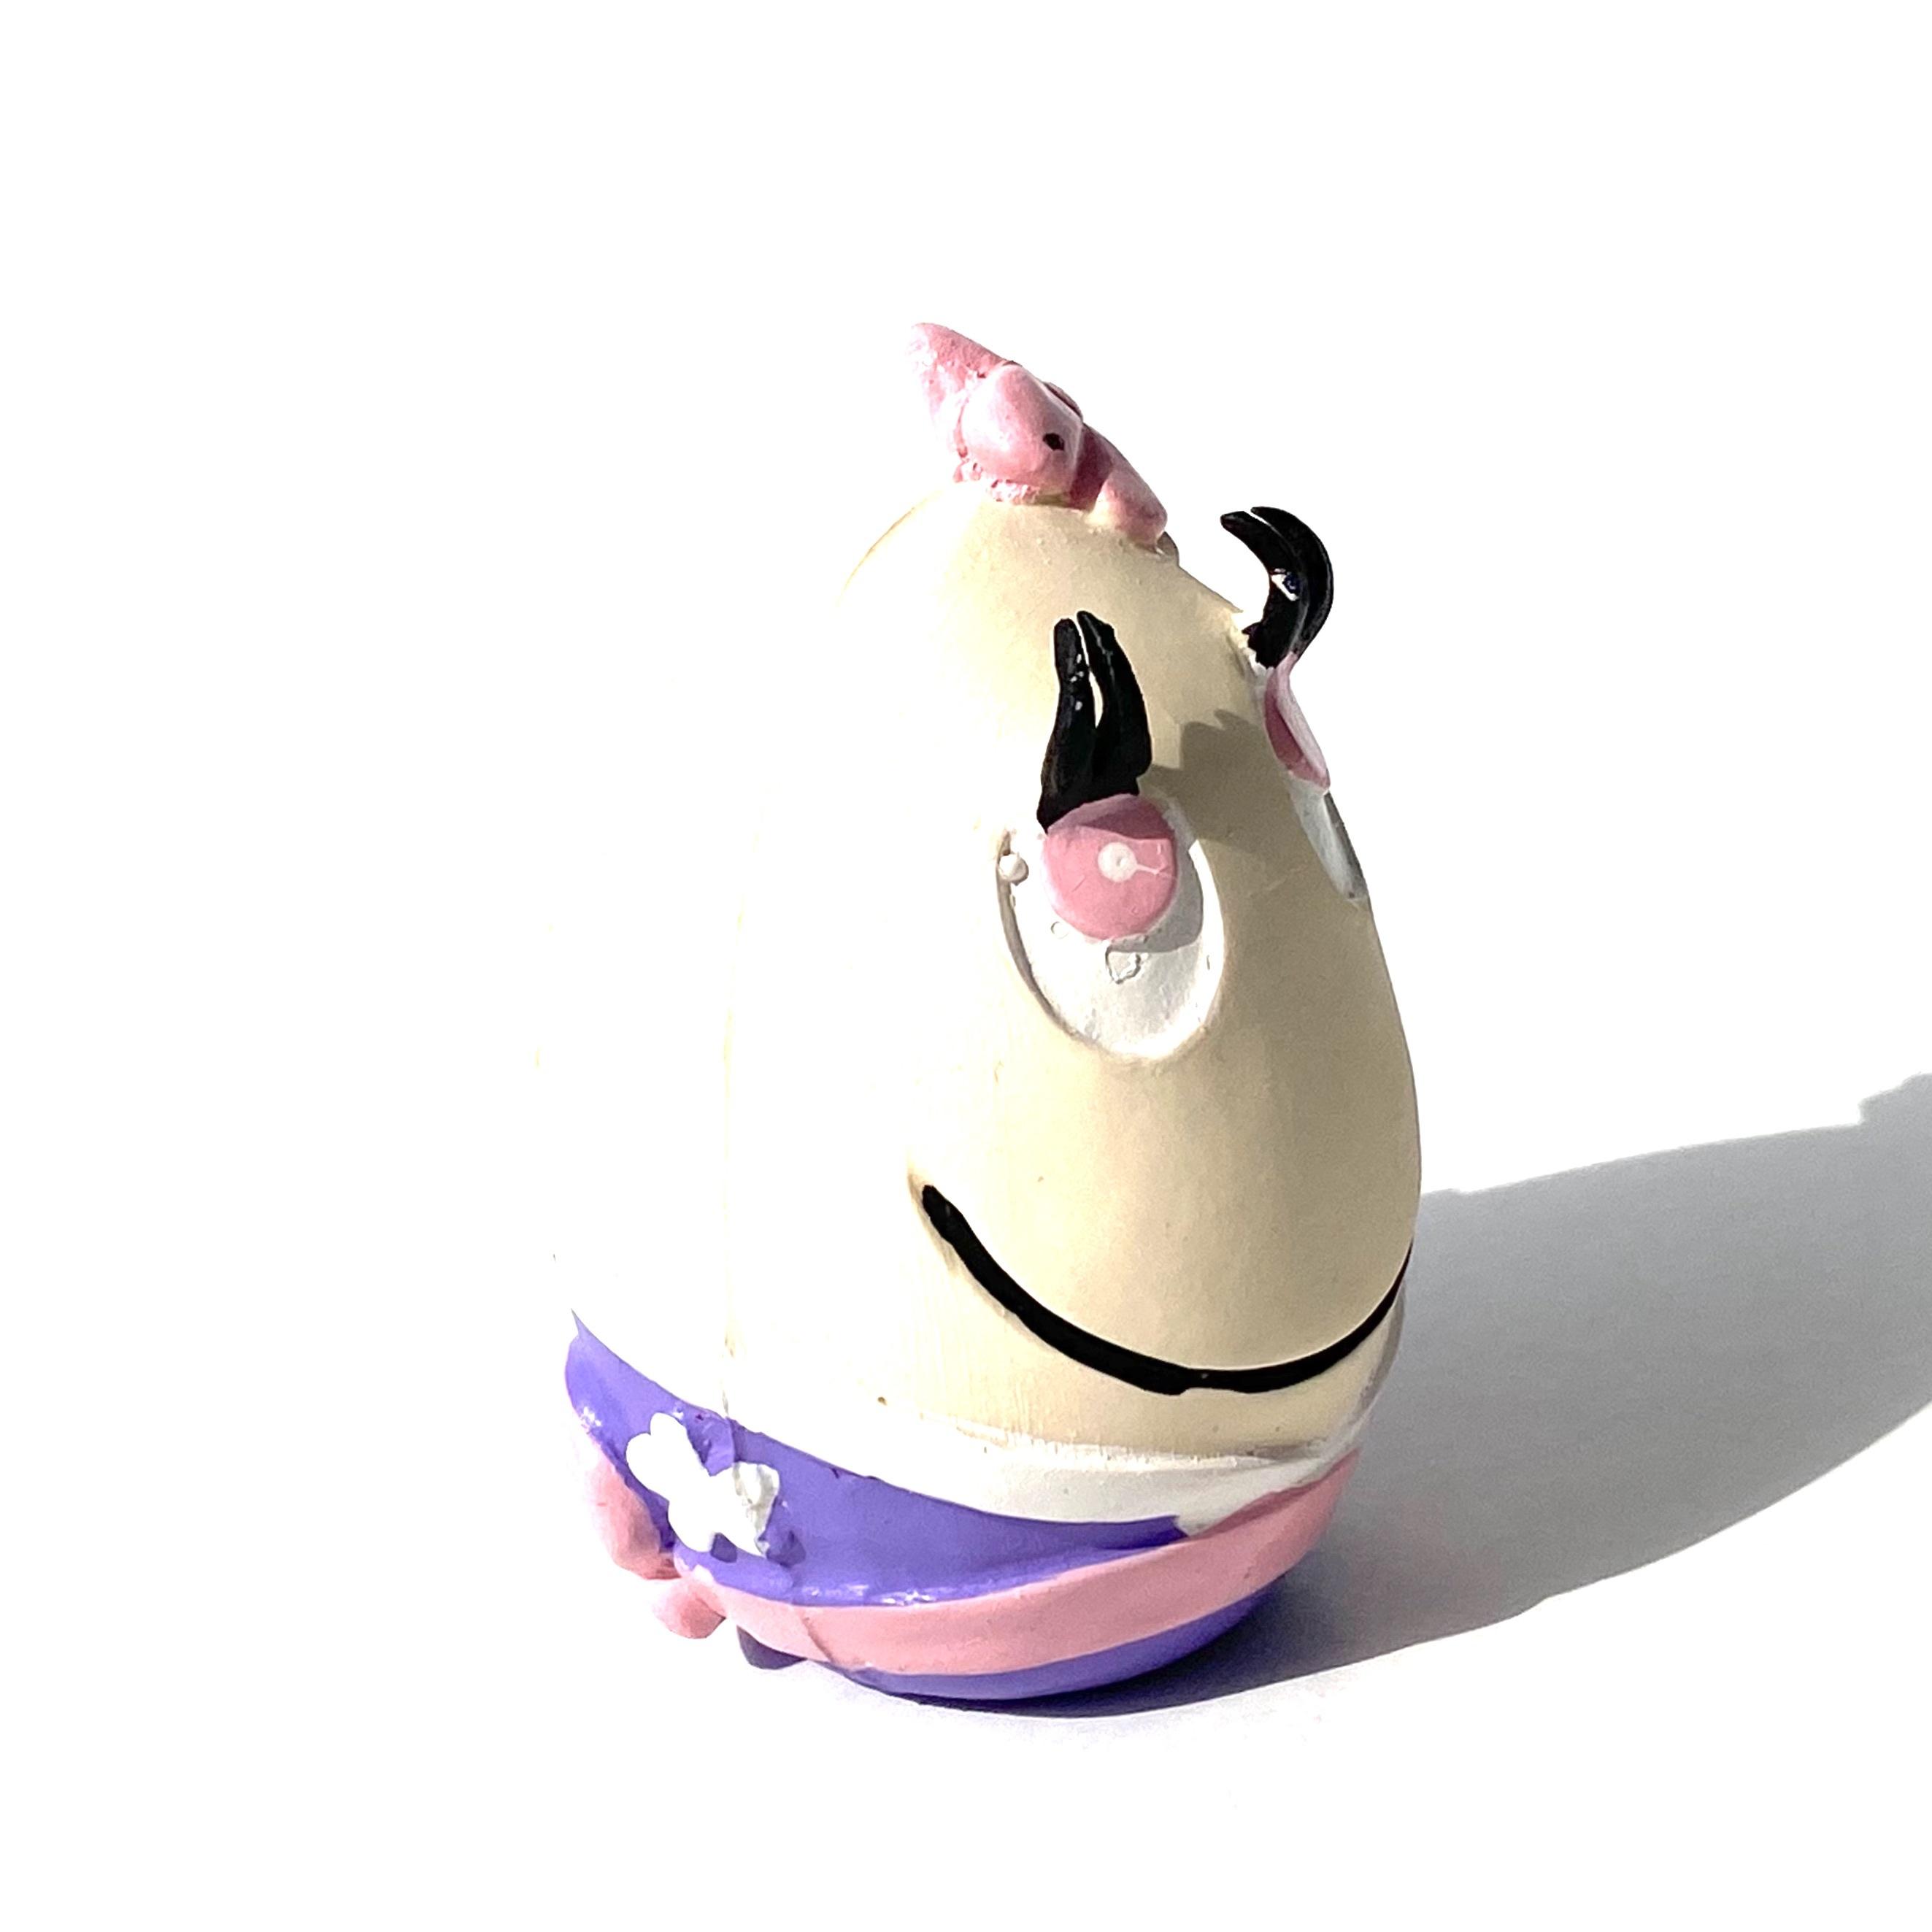 LANCO Kimono Egg ランコ 着物タマゴ_d0217958_15585420.jpeg